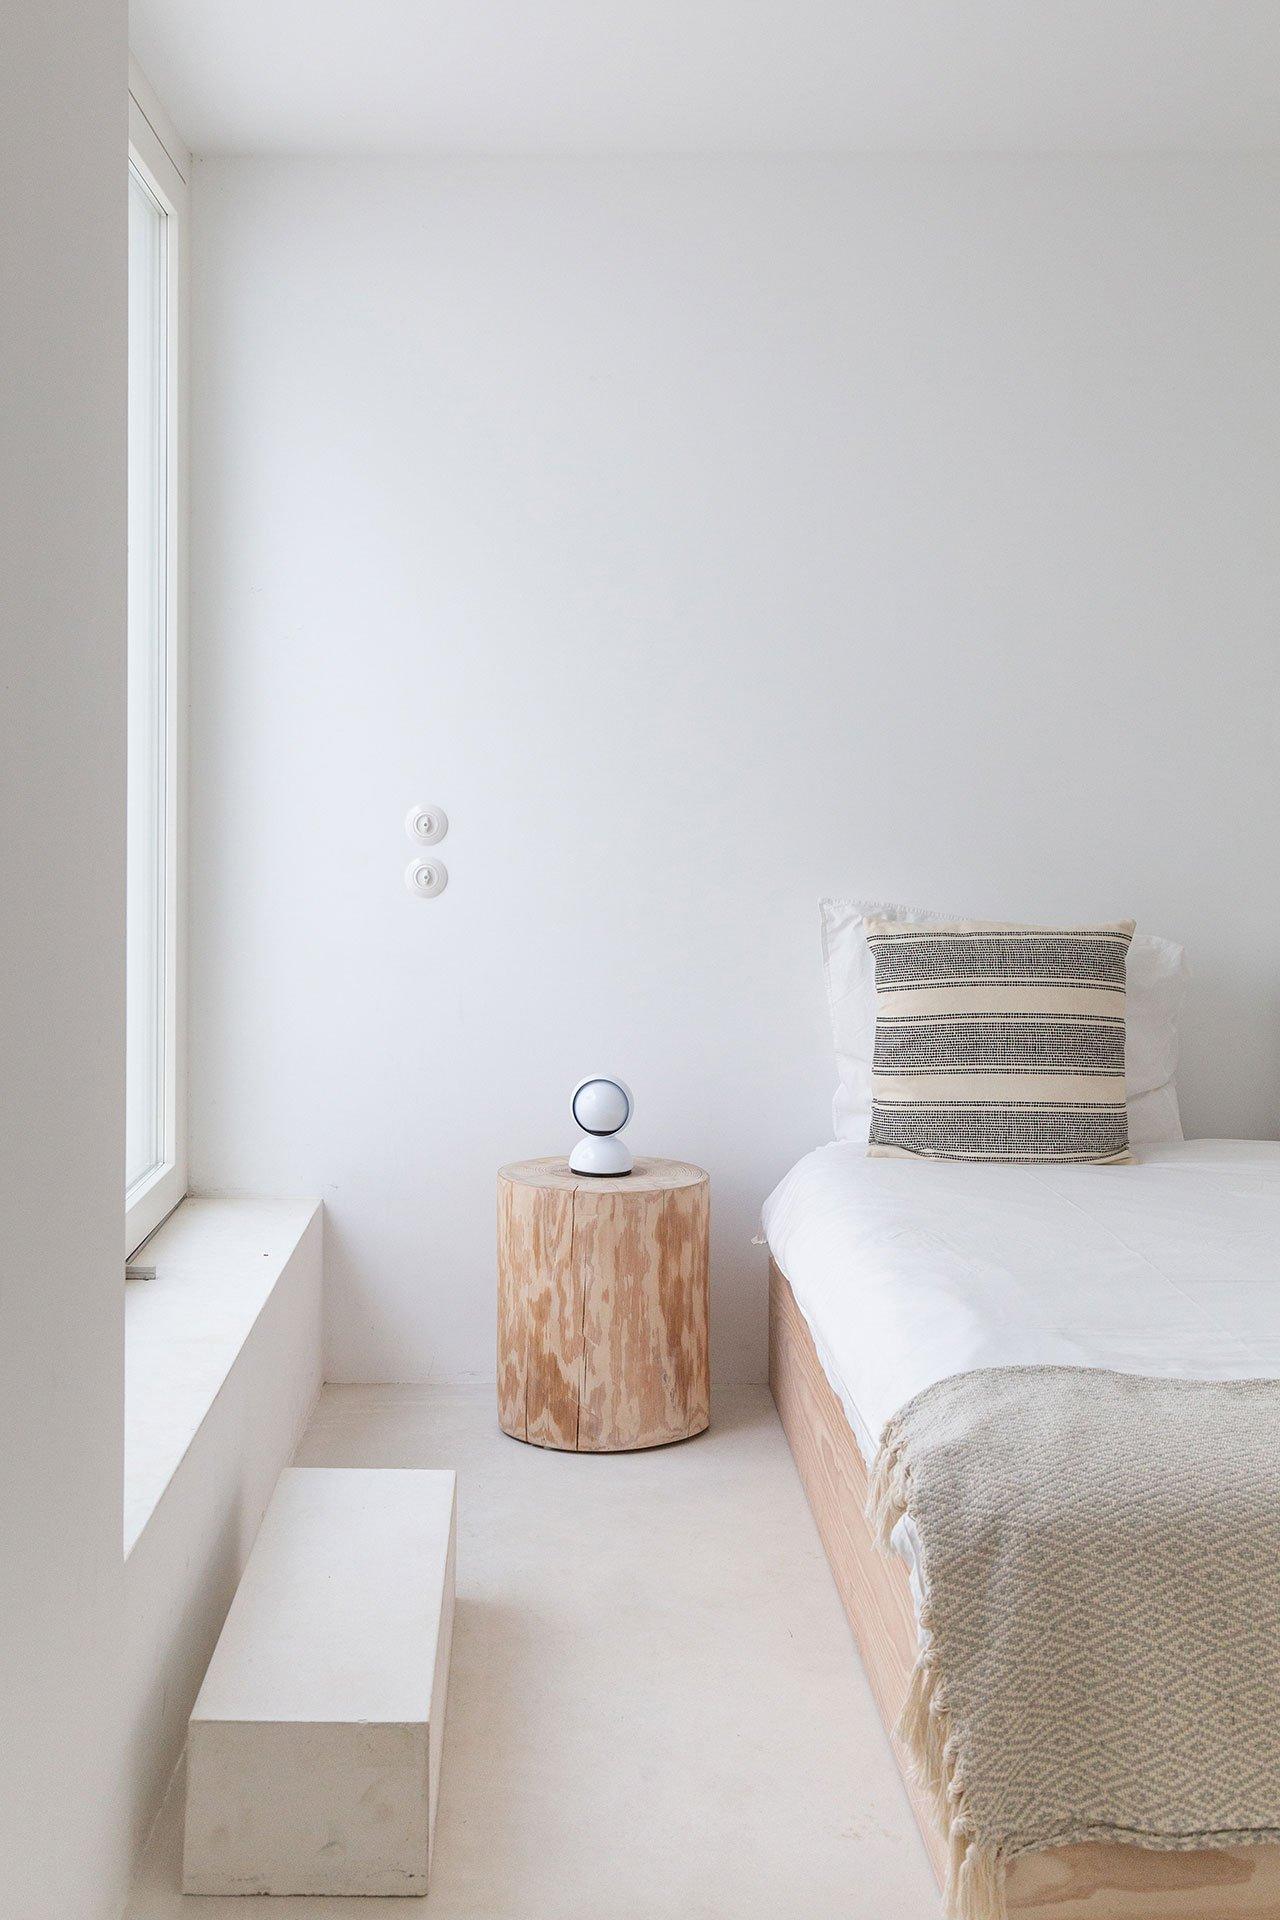 casa-luum-minimalizmus-a-portugal-videken-noko-09.jpg